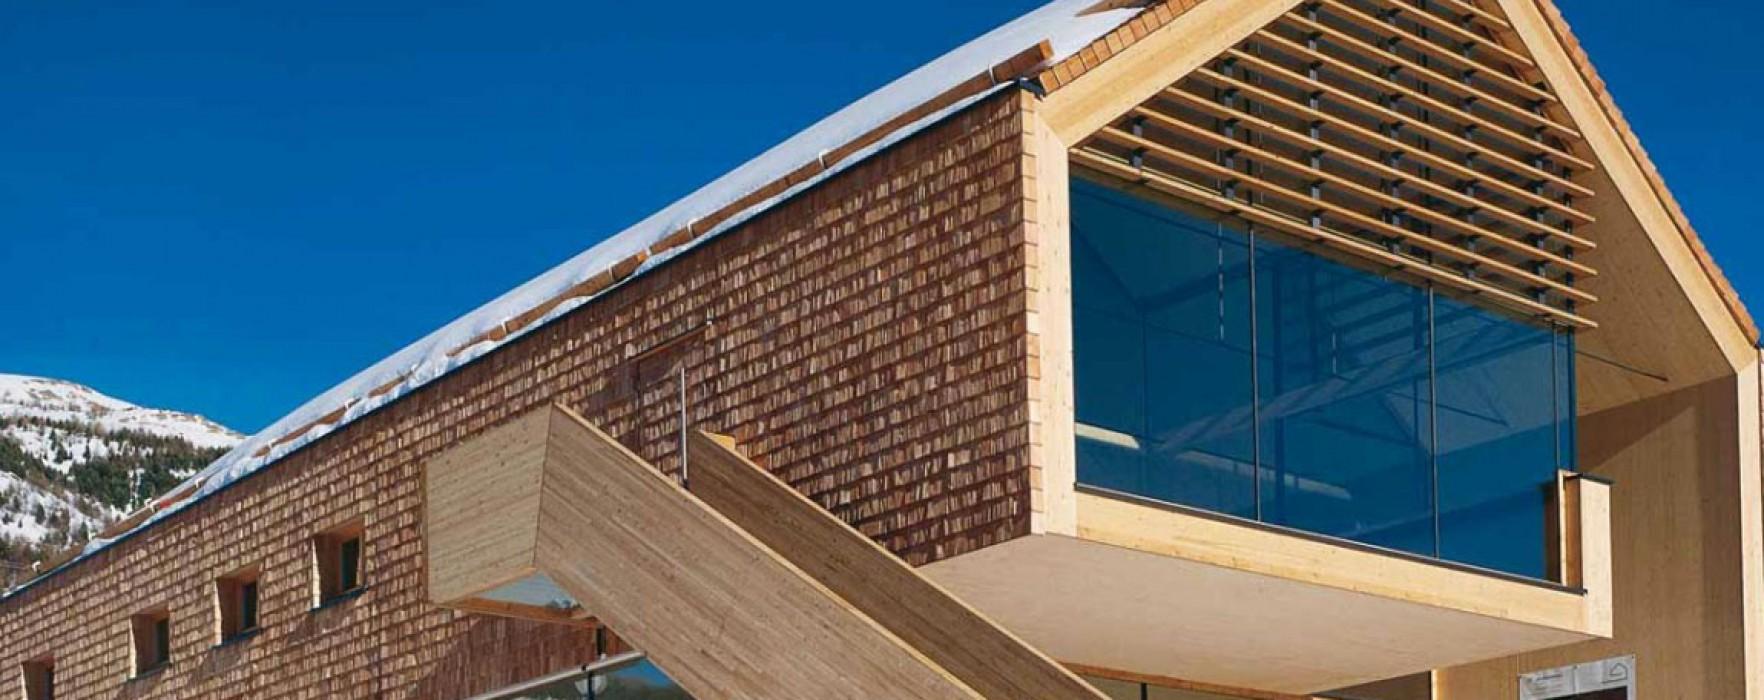 Costo costruzione casa beautiful casa in costruzione with - Costo costruzione casa in legno ...